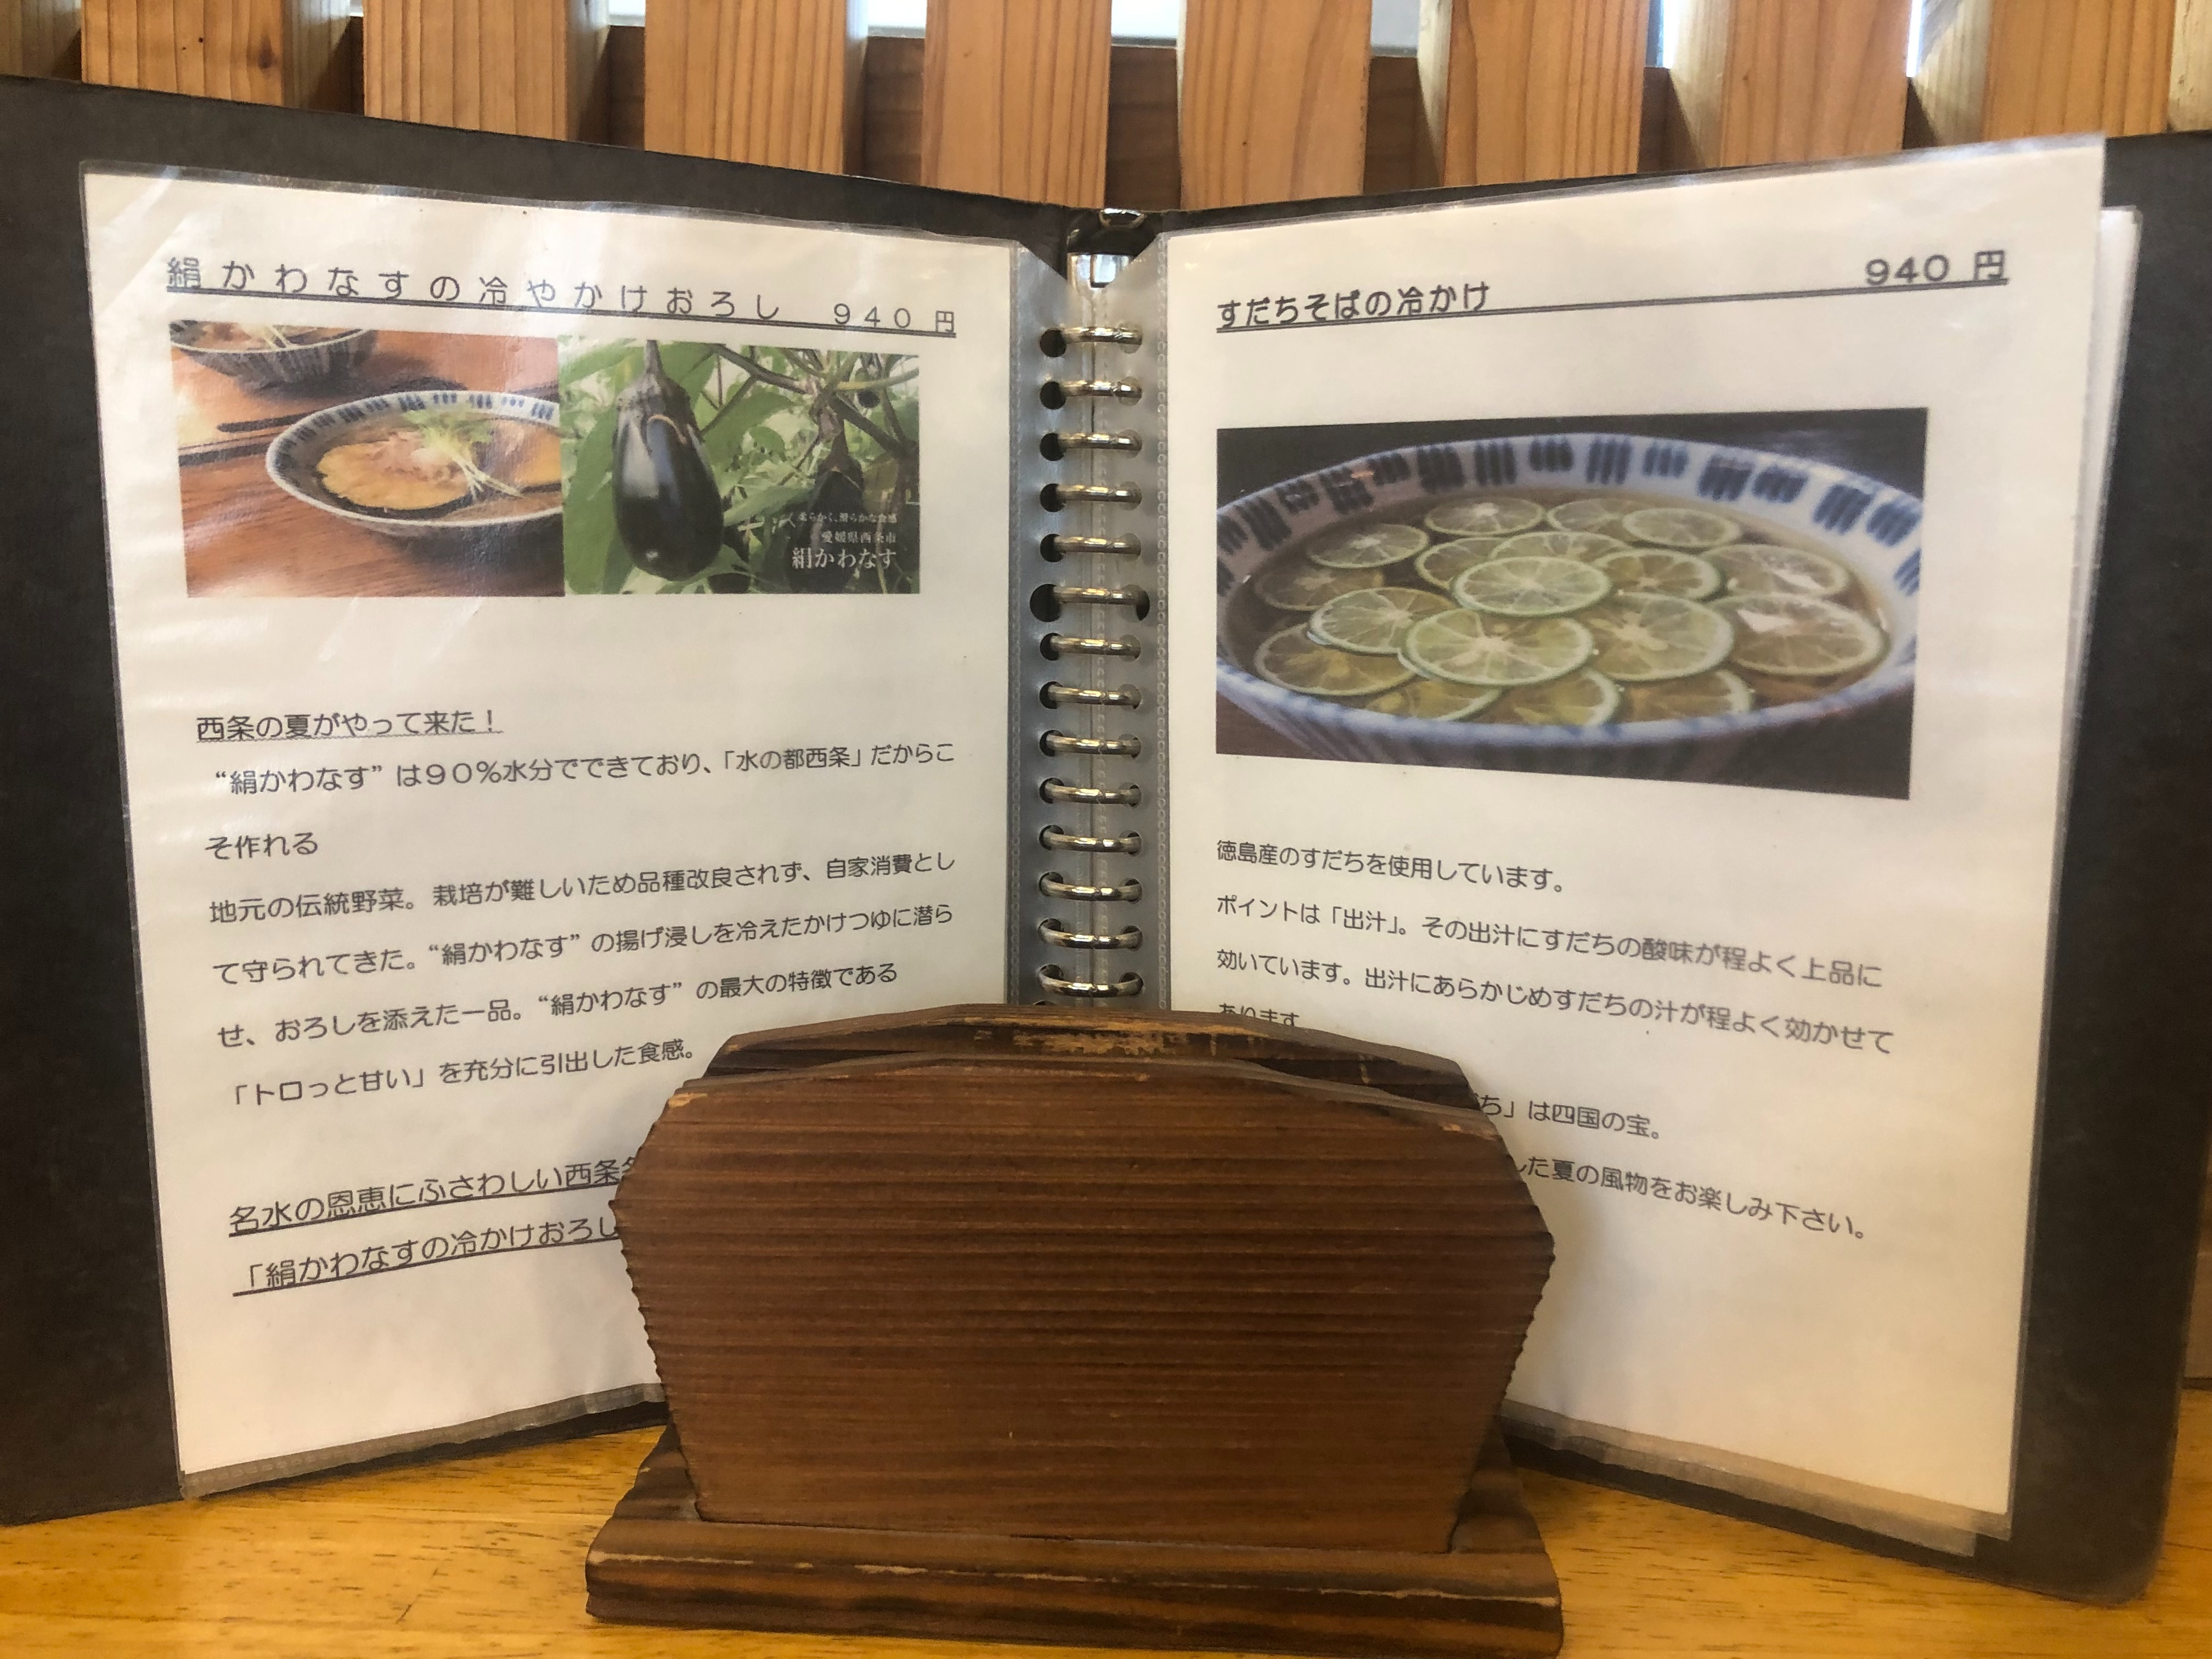 f:id:masanori-kato1972:20190713185015j:image